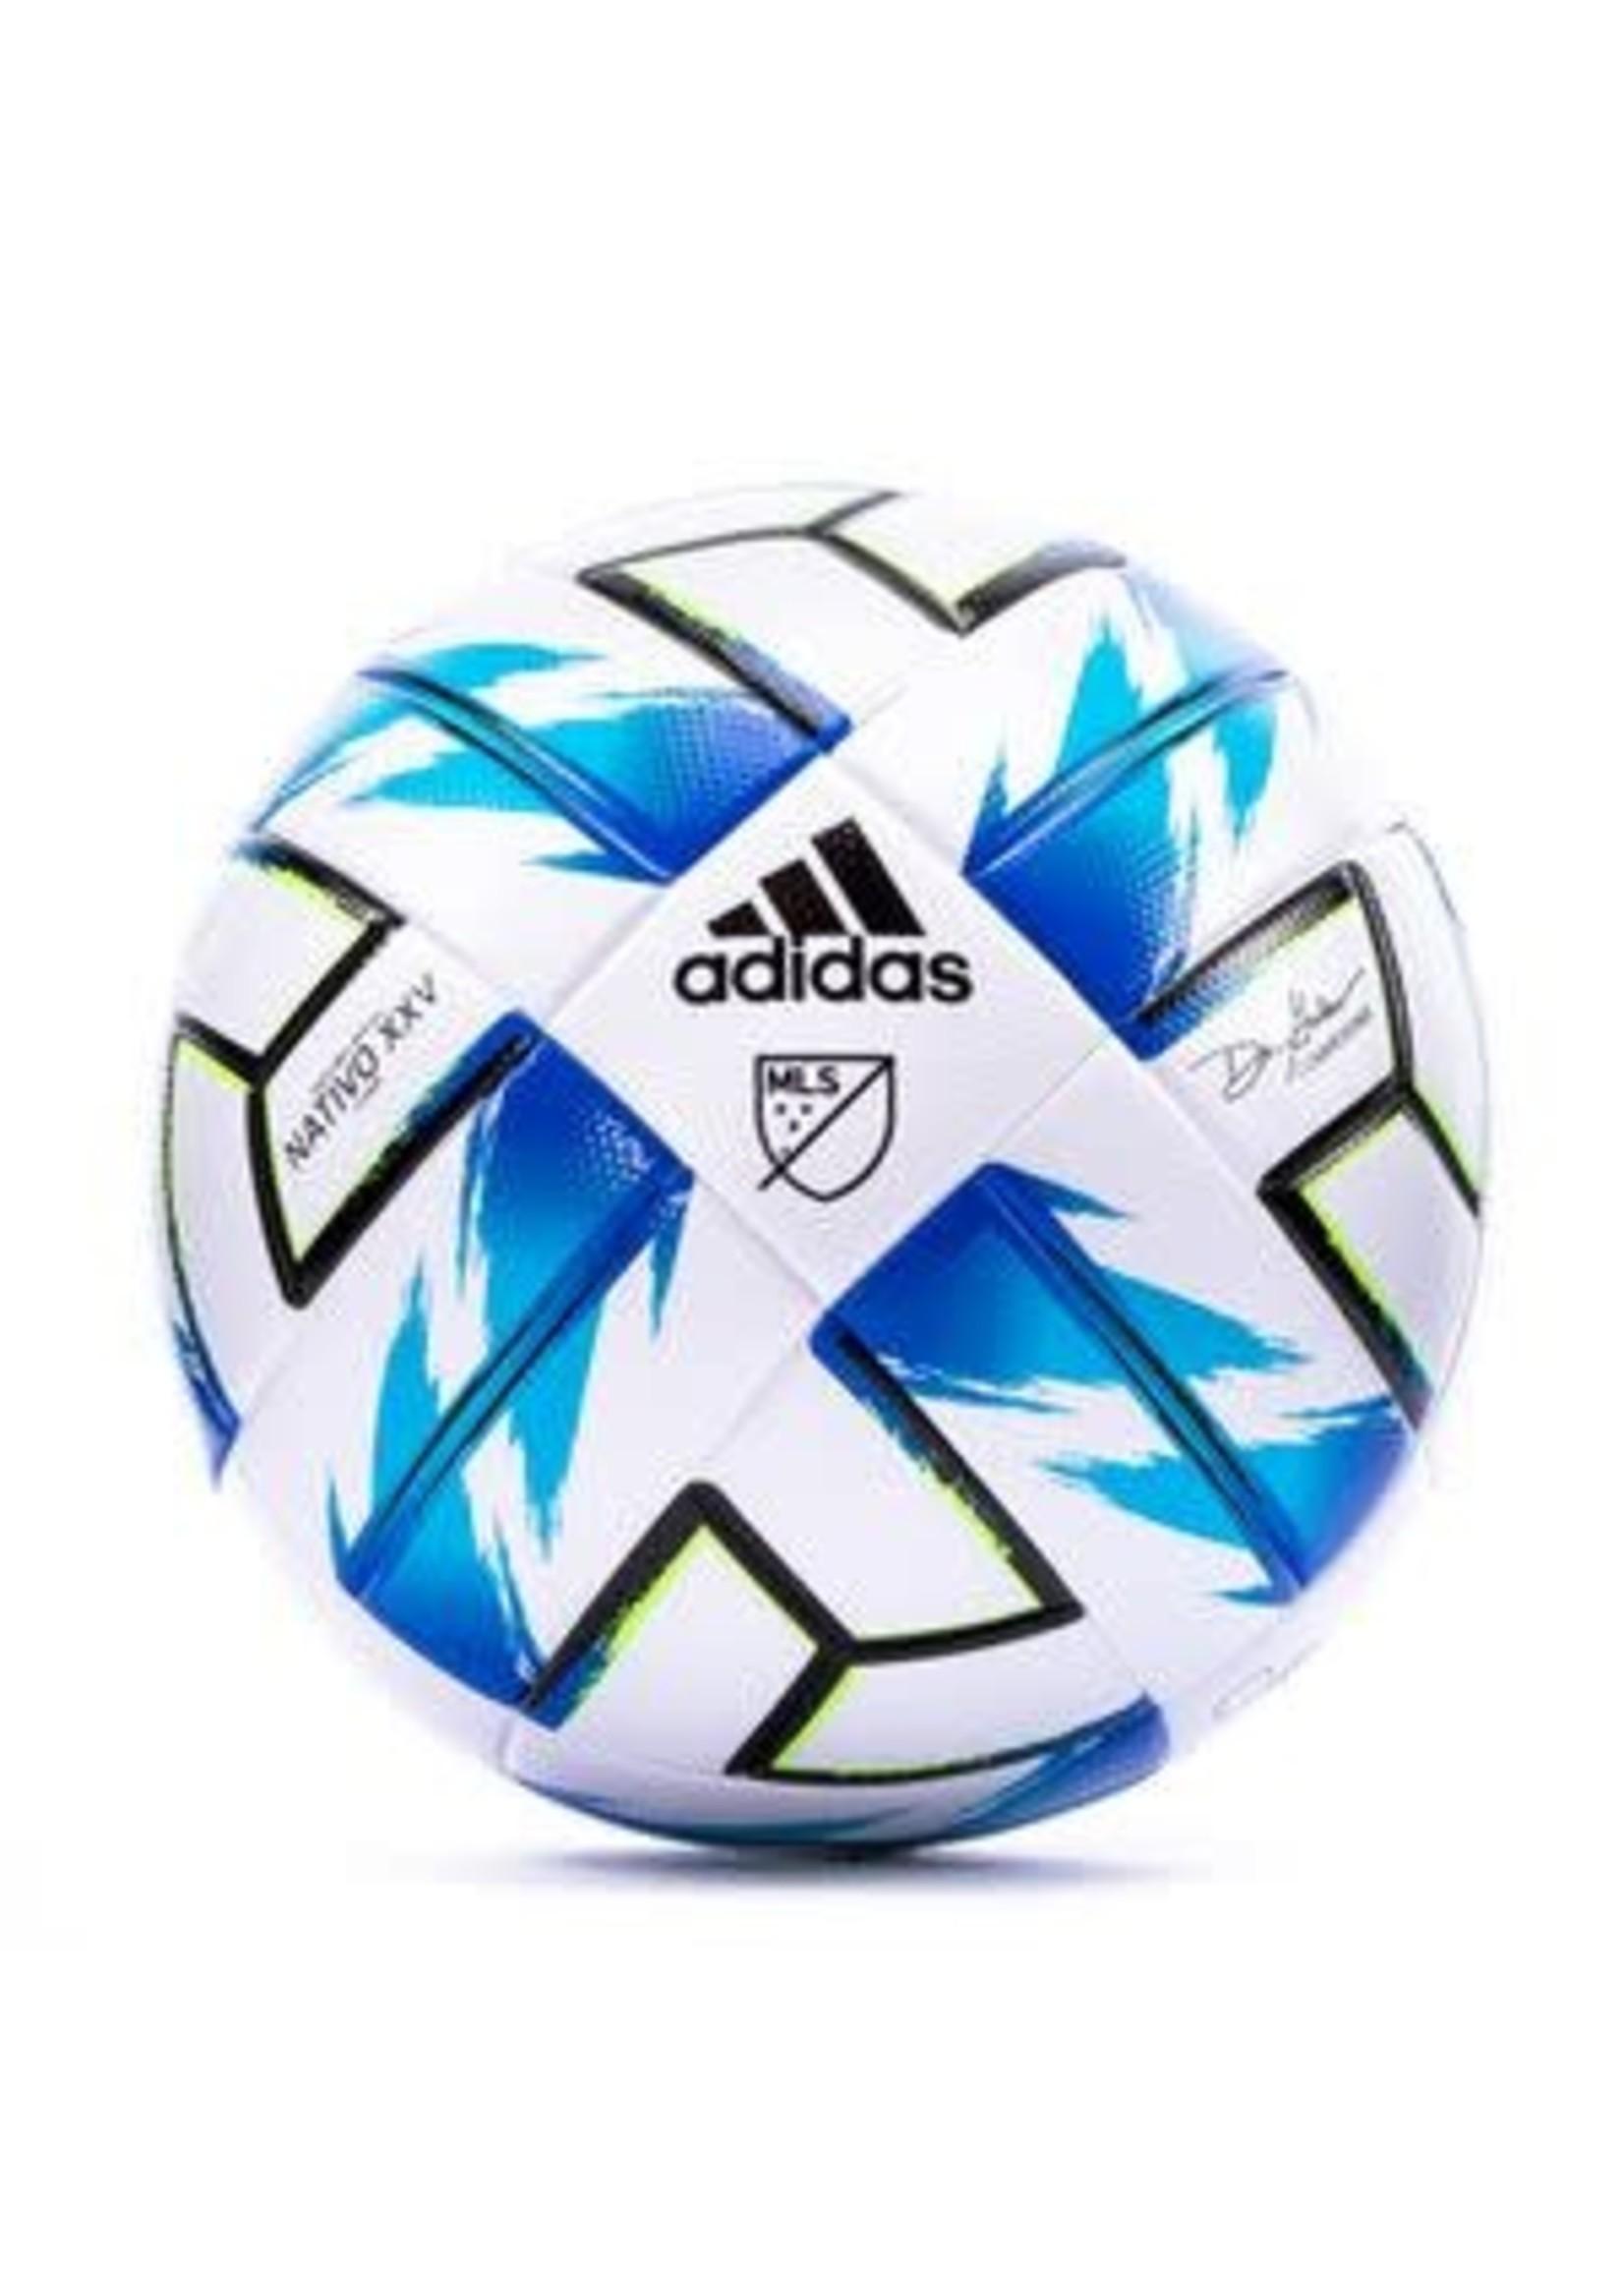 Adidas MLS LGE NFHS BALL